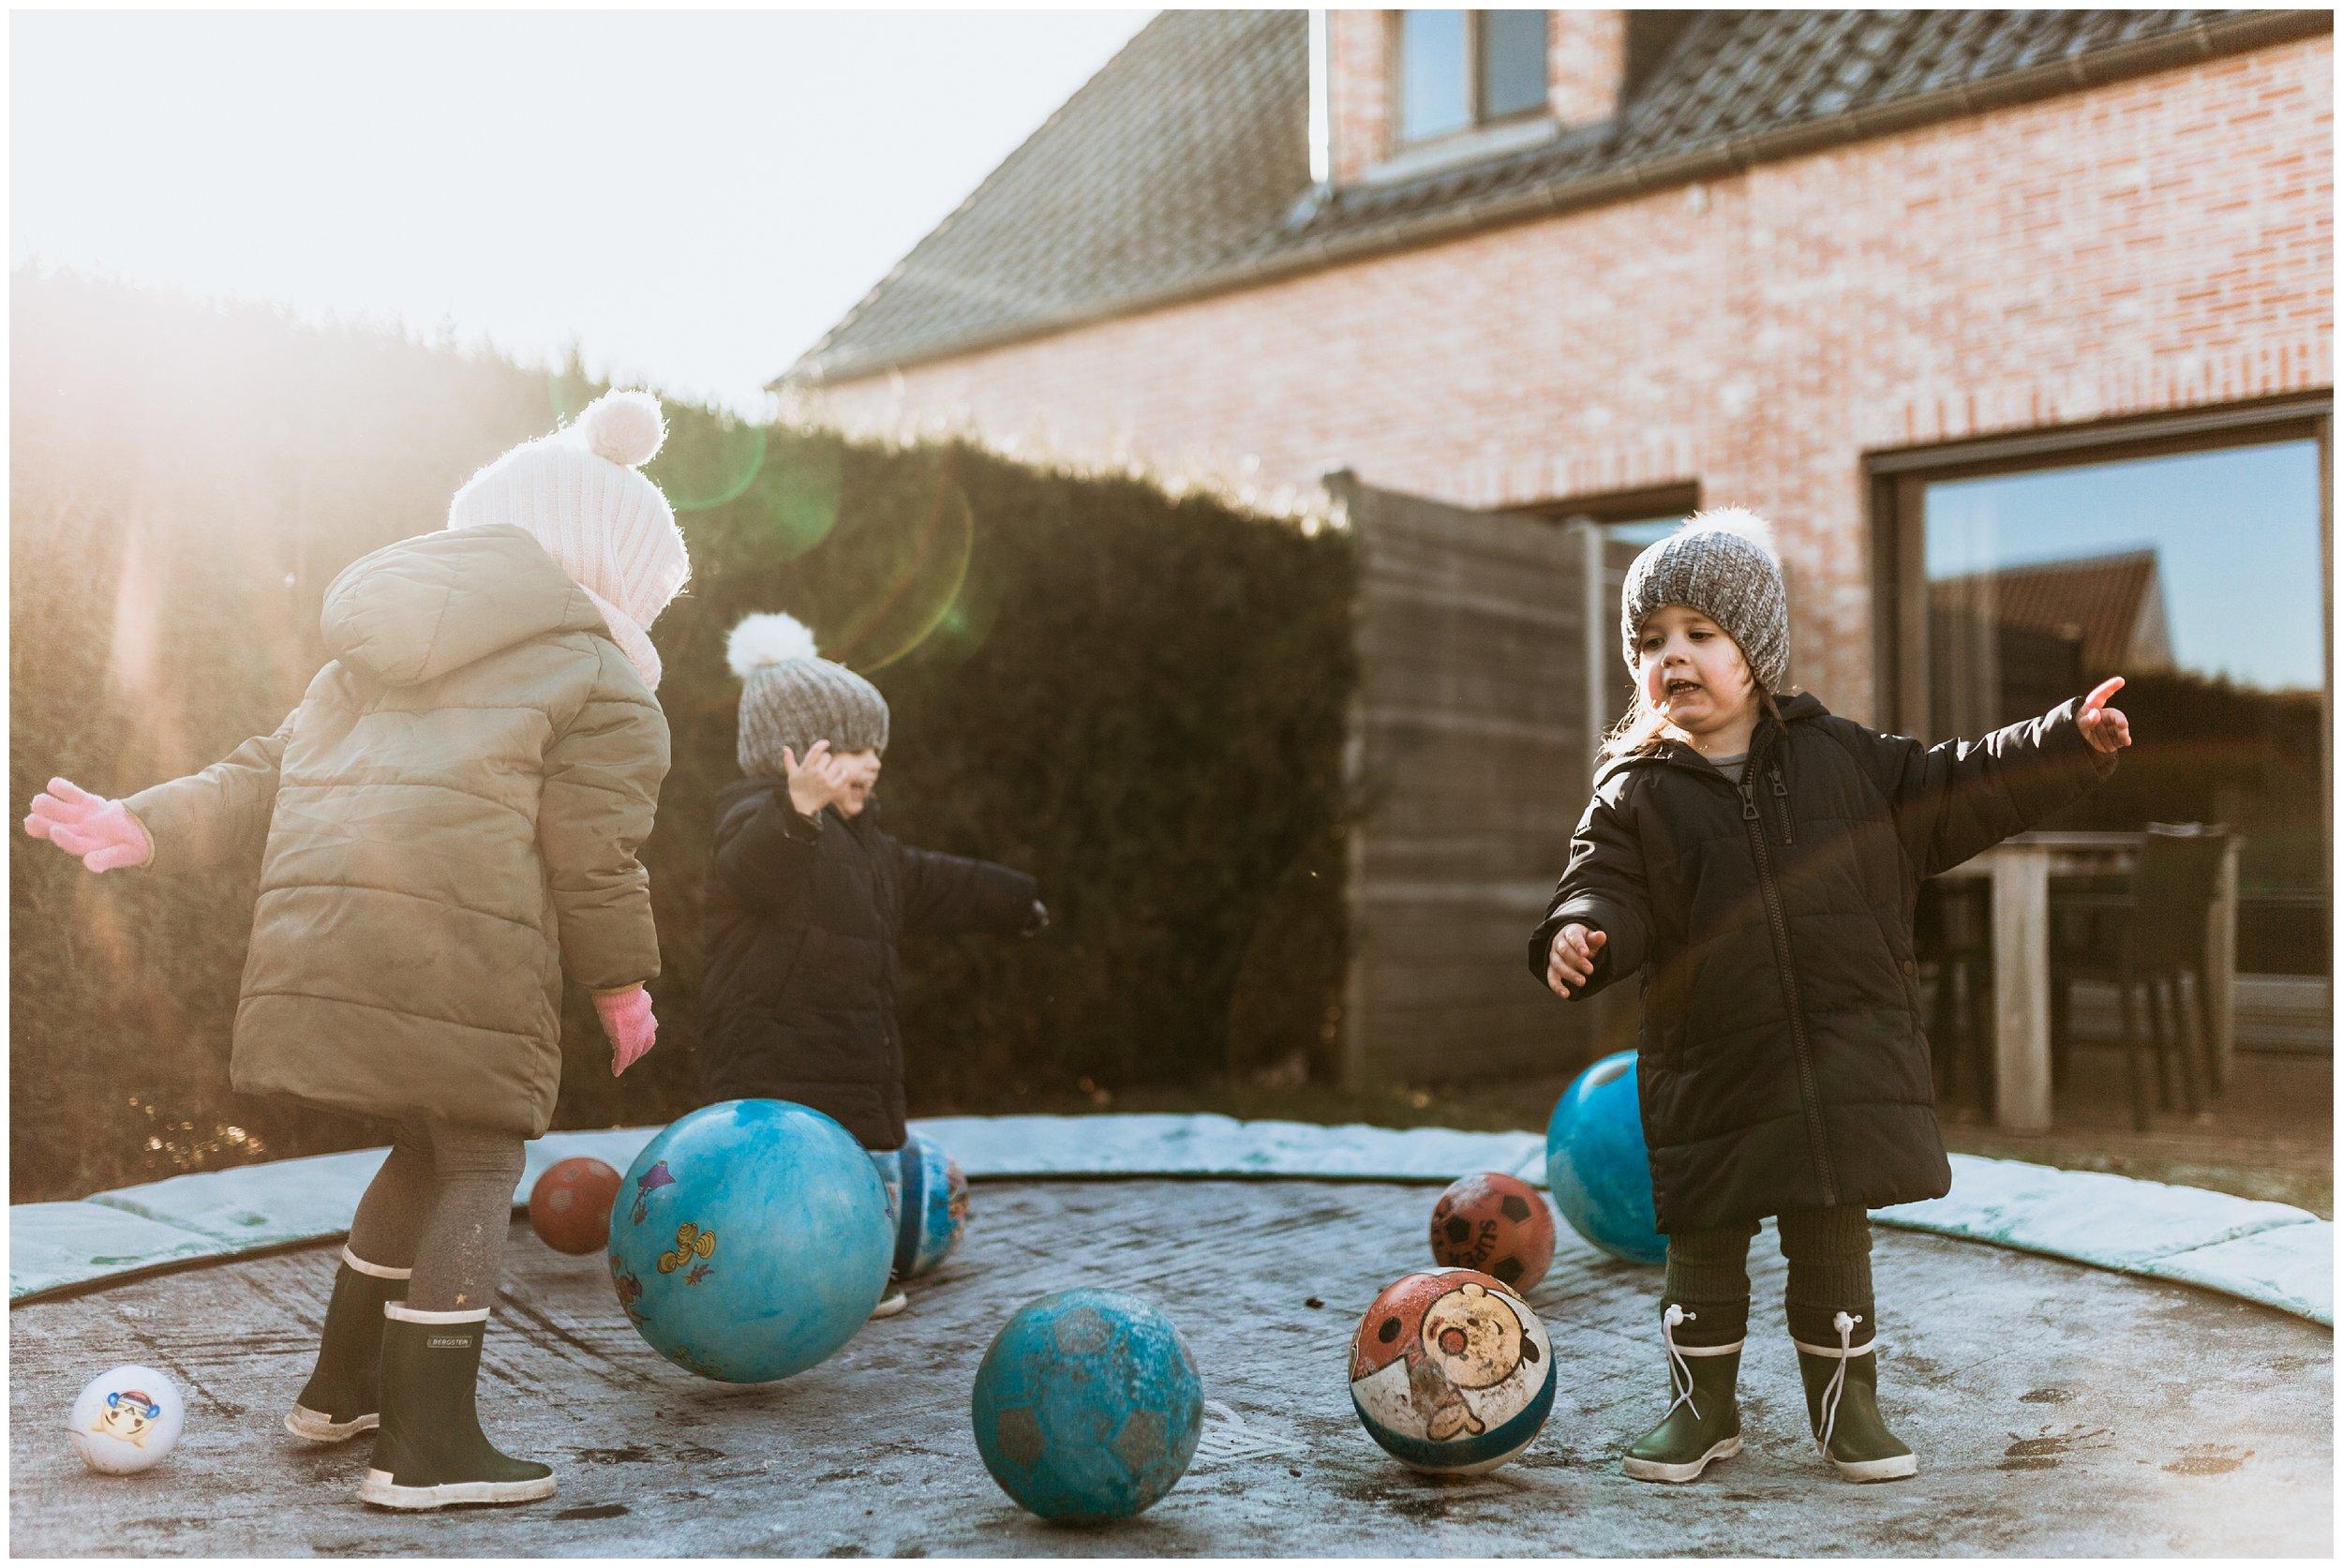 Day-in-the-life-lisa-helsen-herentals-vorselaar_0006.jpg